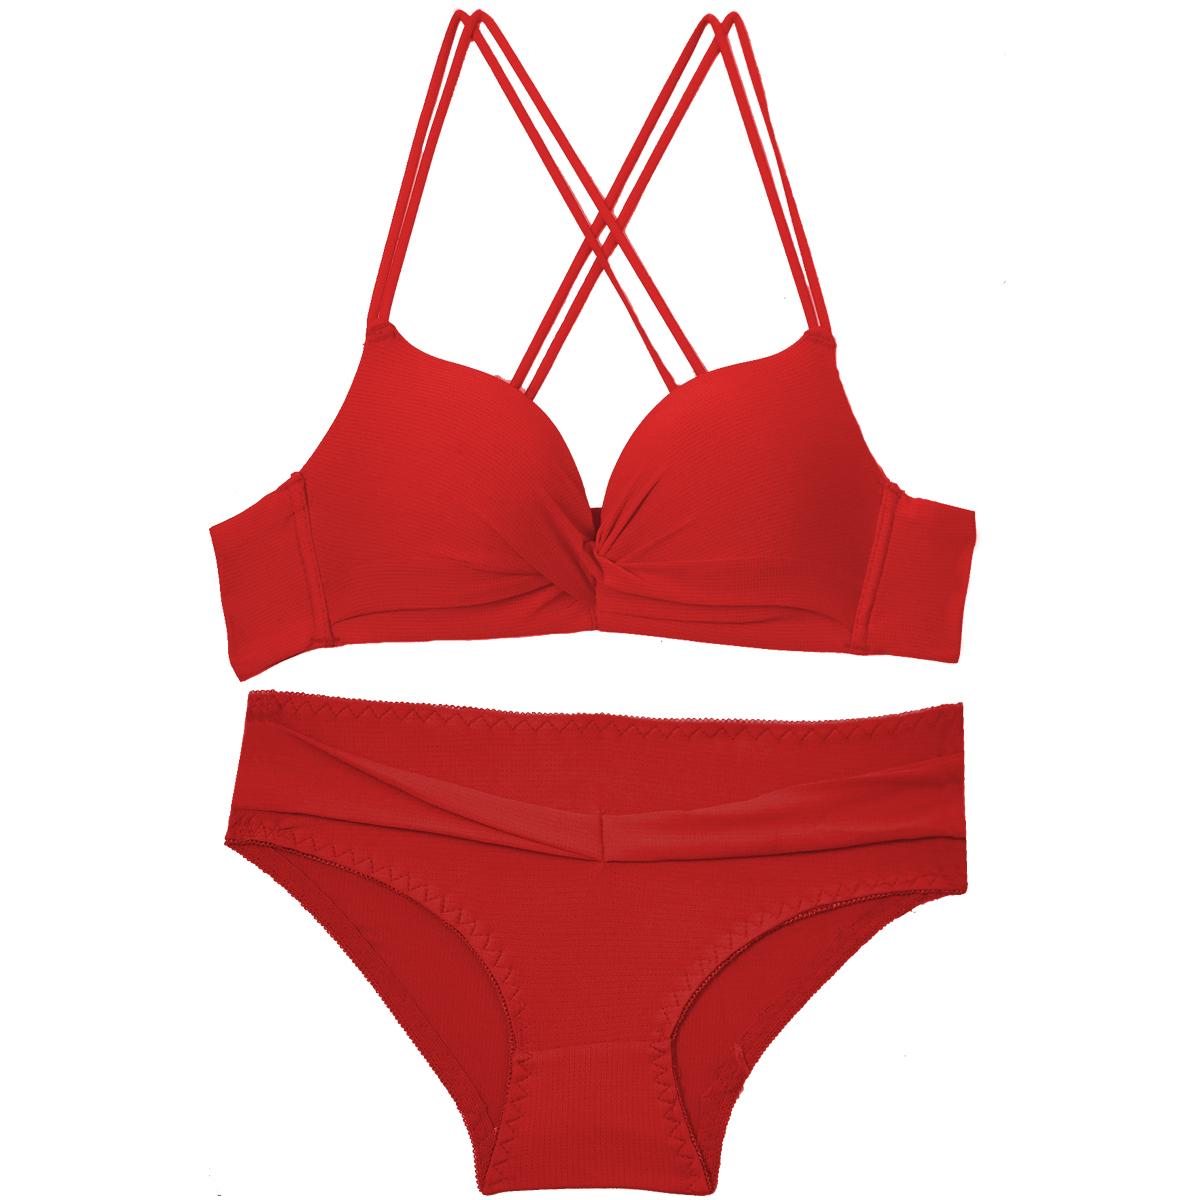 Flourish Seamless Bra Set For Women Underwear Push Up Lingerie Set Wire Free Padded Bra And Panty Set  Intimates Female-6933